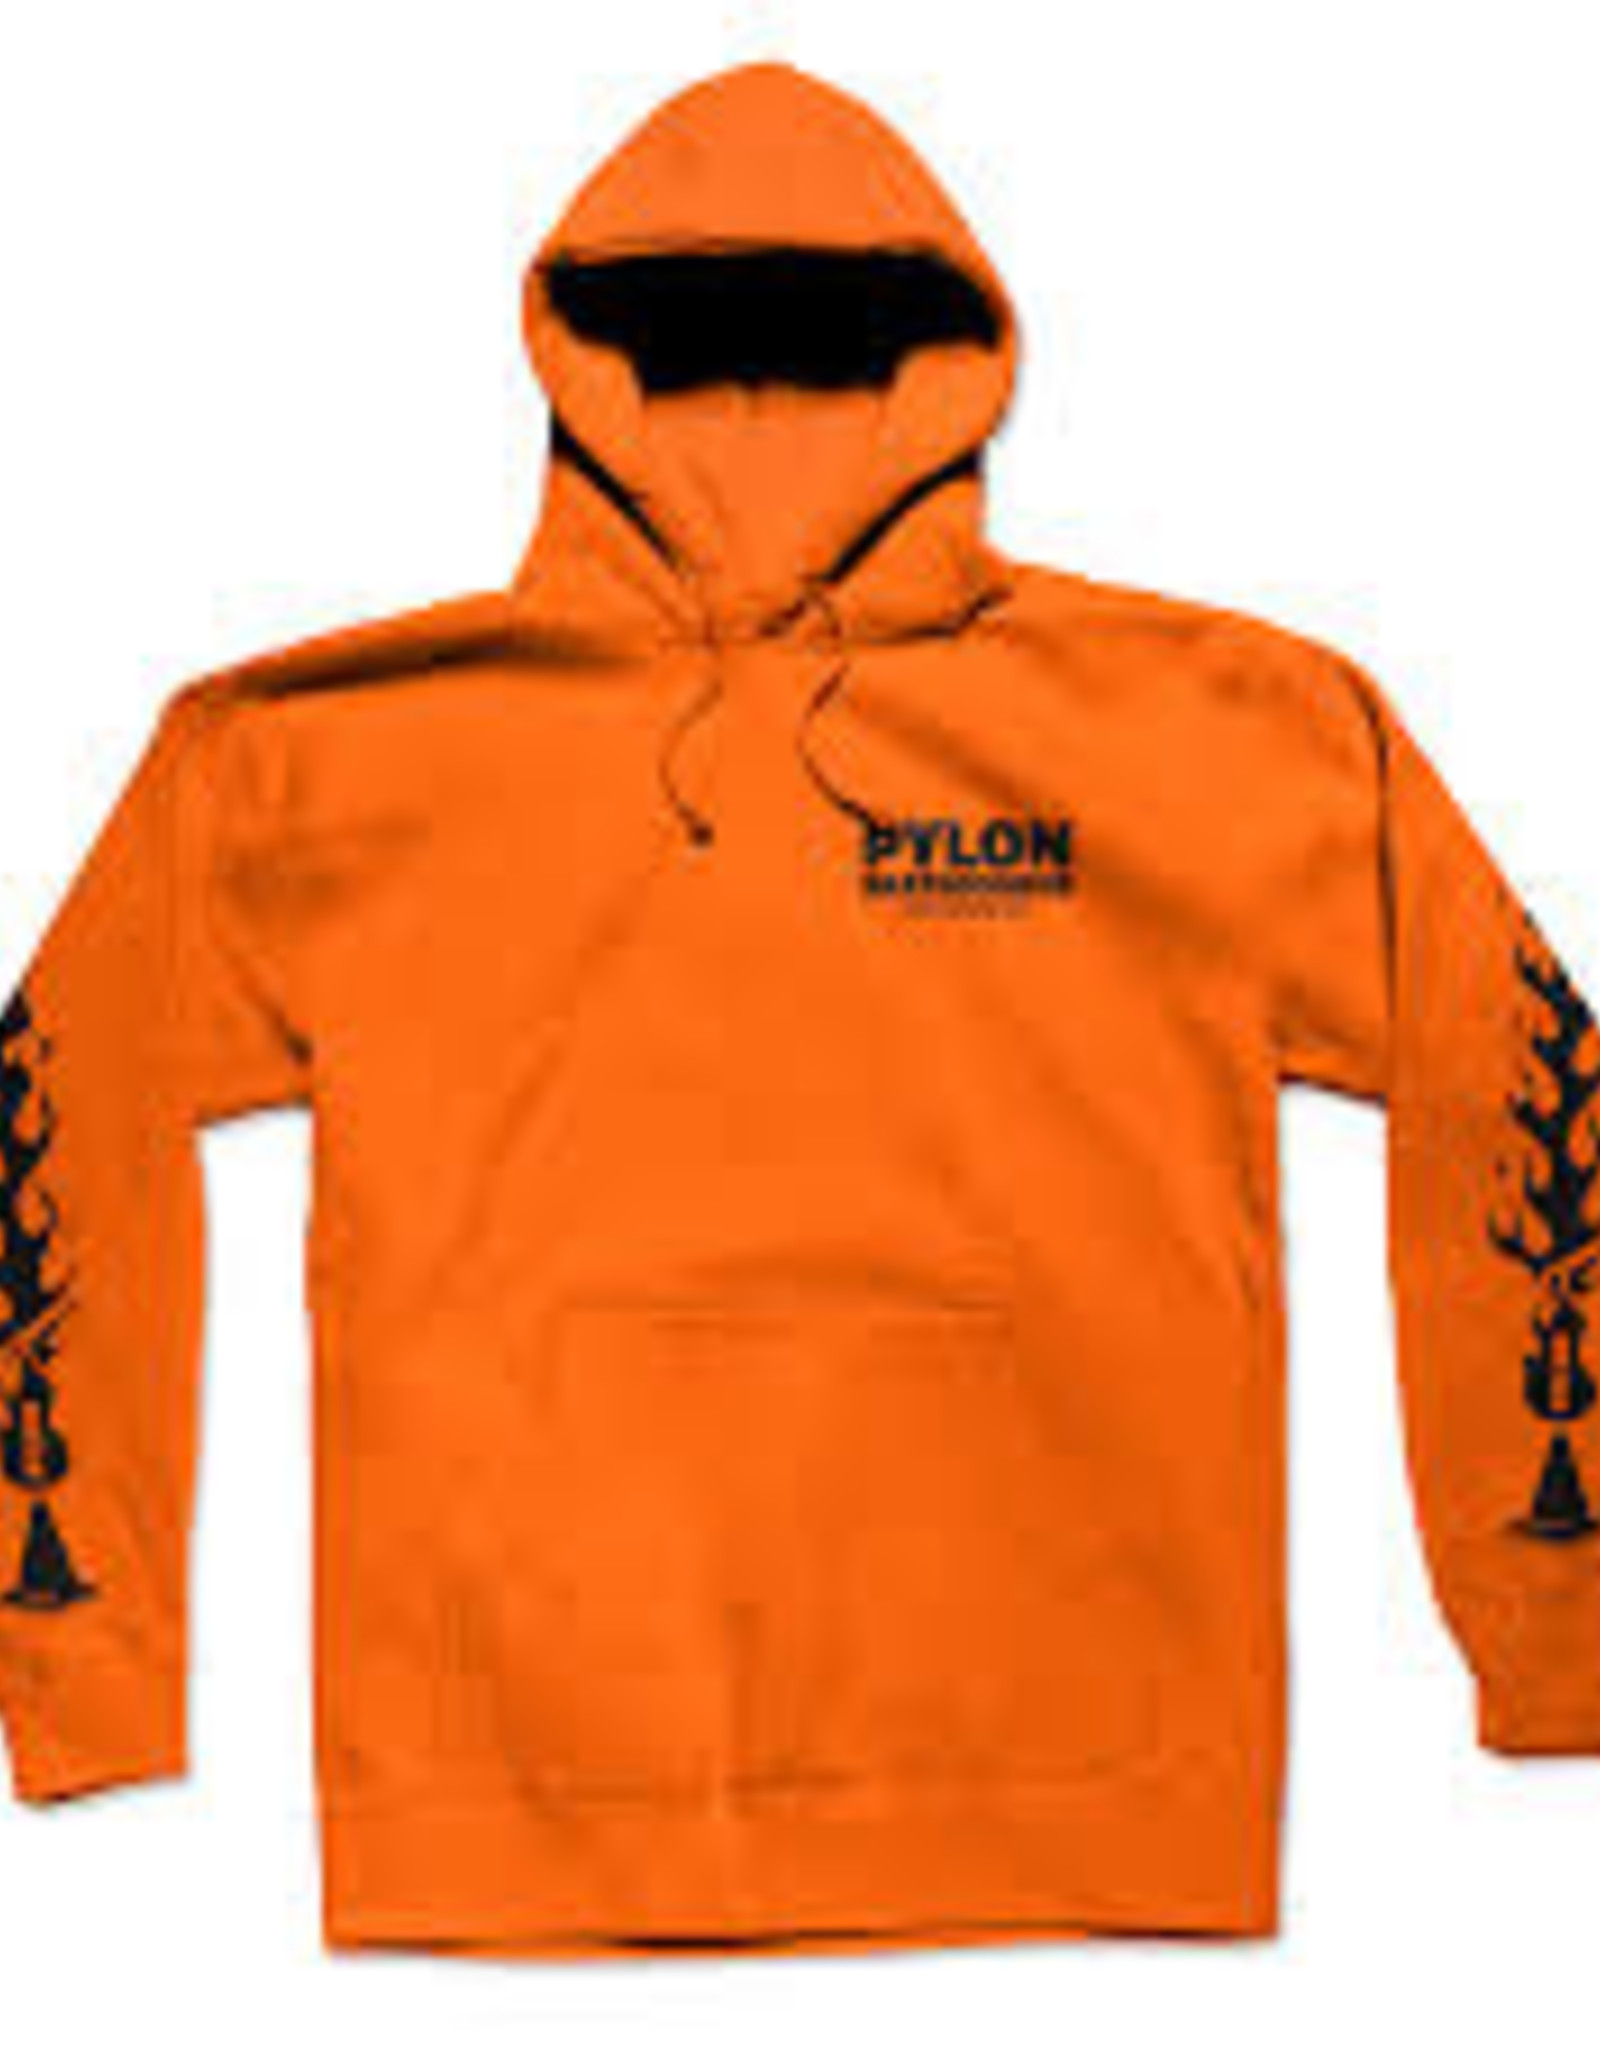 Pylon PYLON FLAMES HOODIE - ORANGE